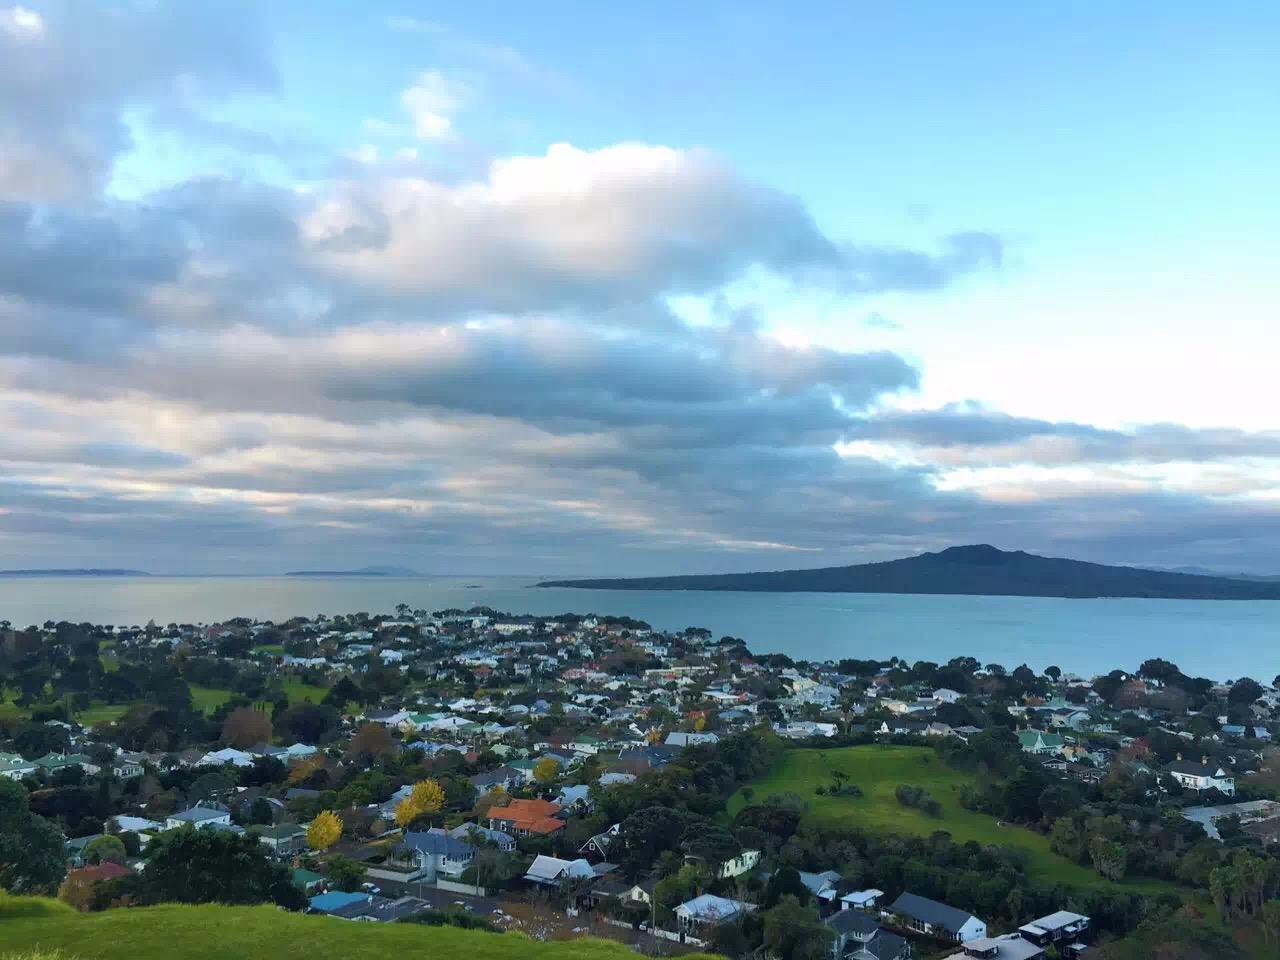 奧克蘭維多利亞山  Mount Victoria, Auckland   -4